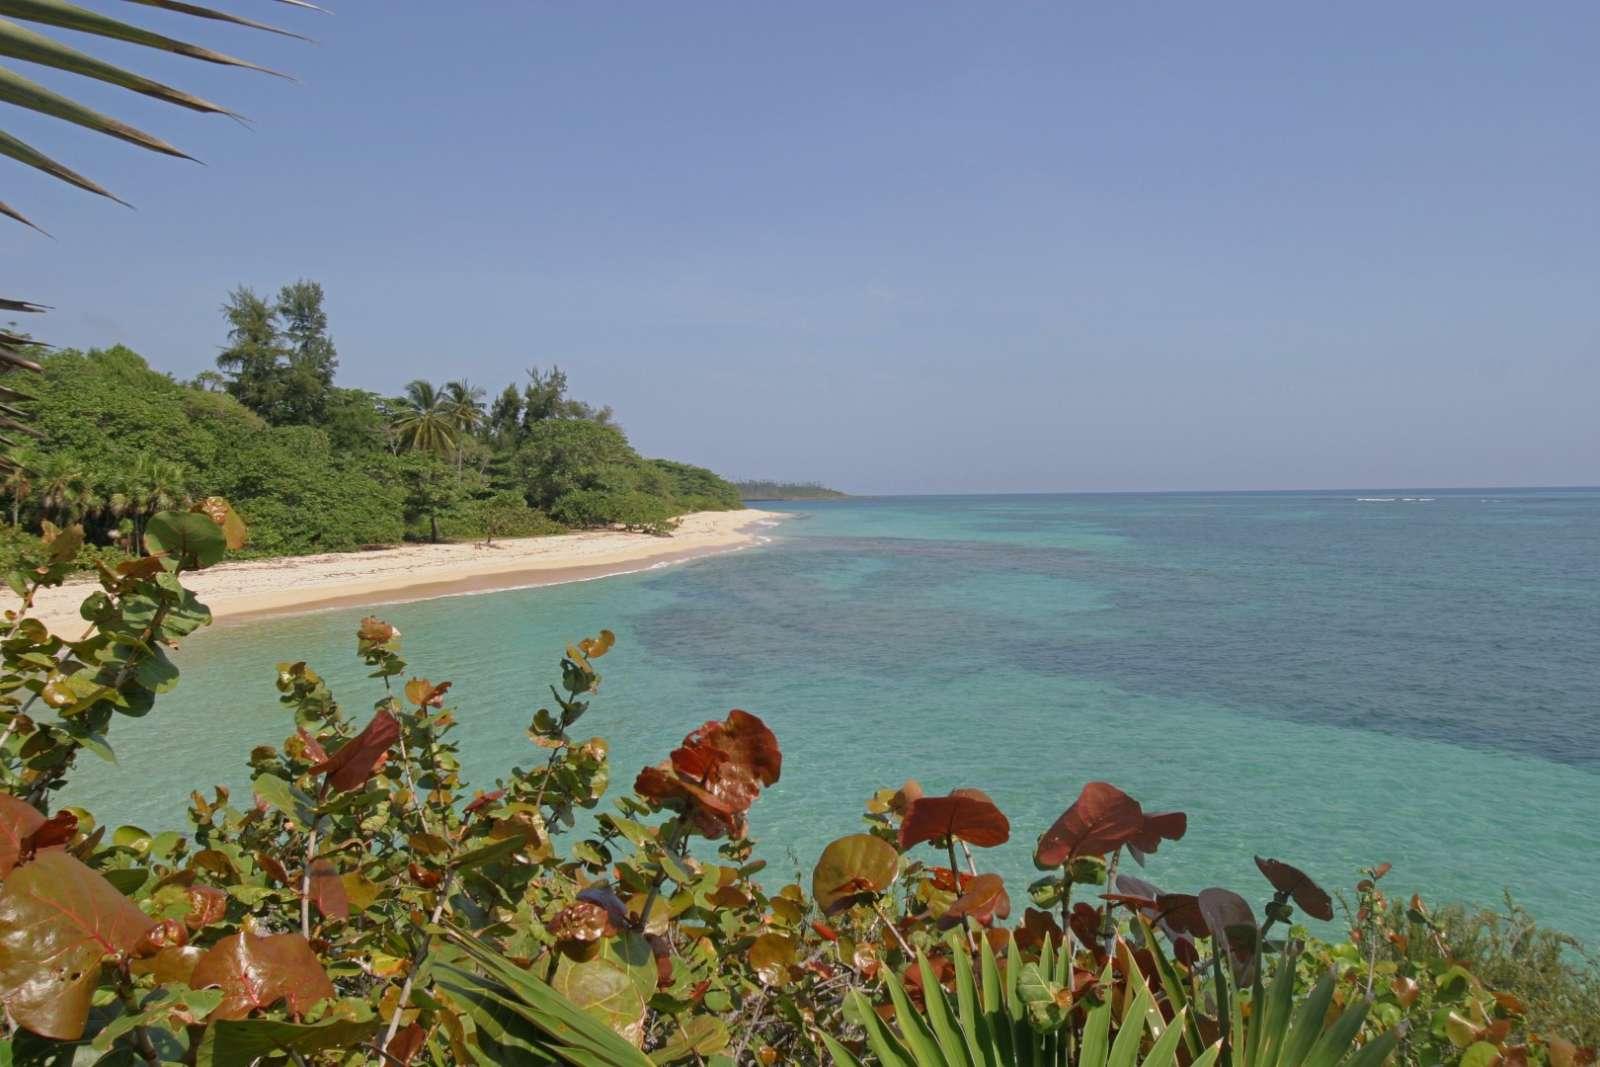 Beach vista at Villa Maguana